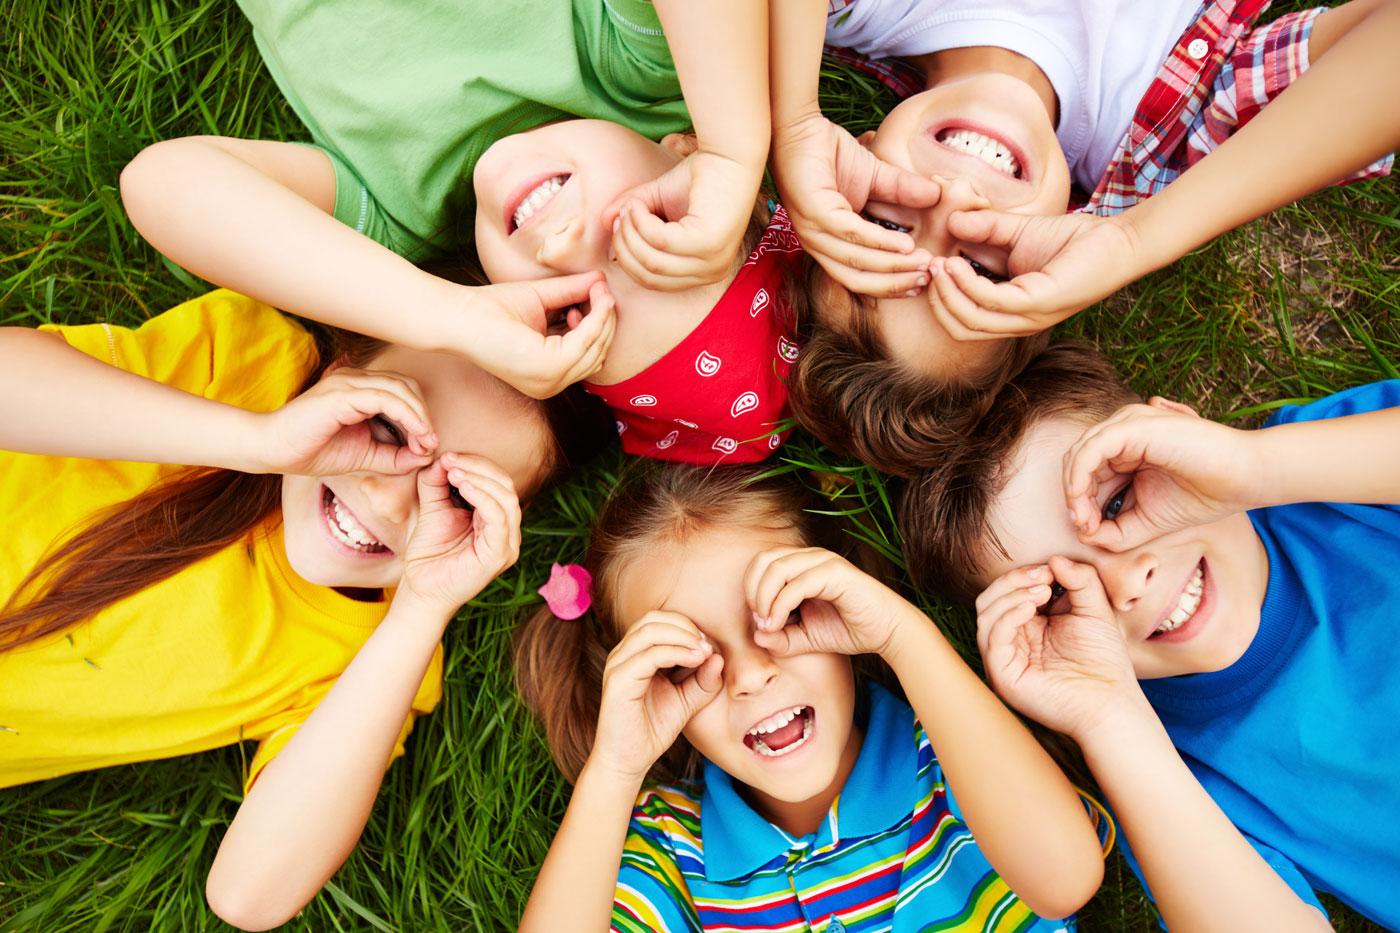 Children bright colourful shirt